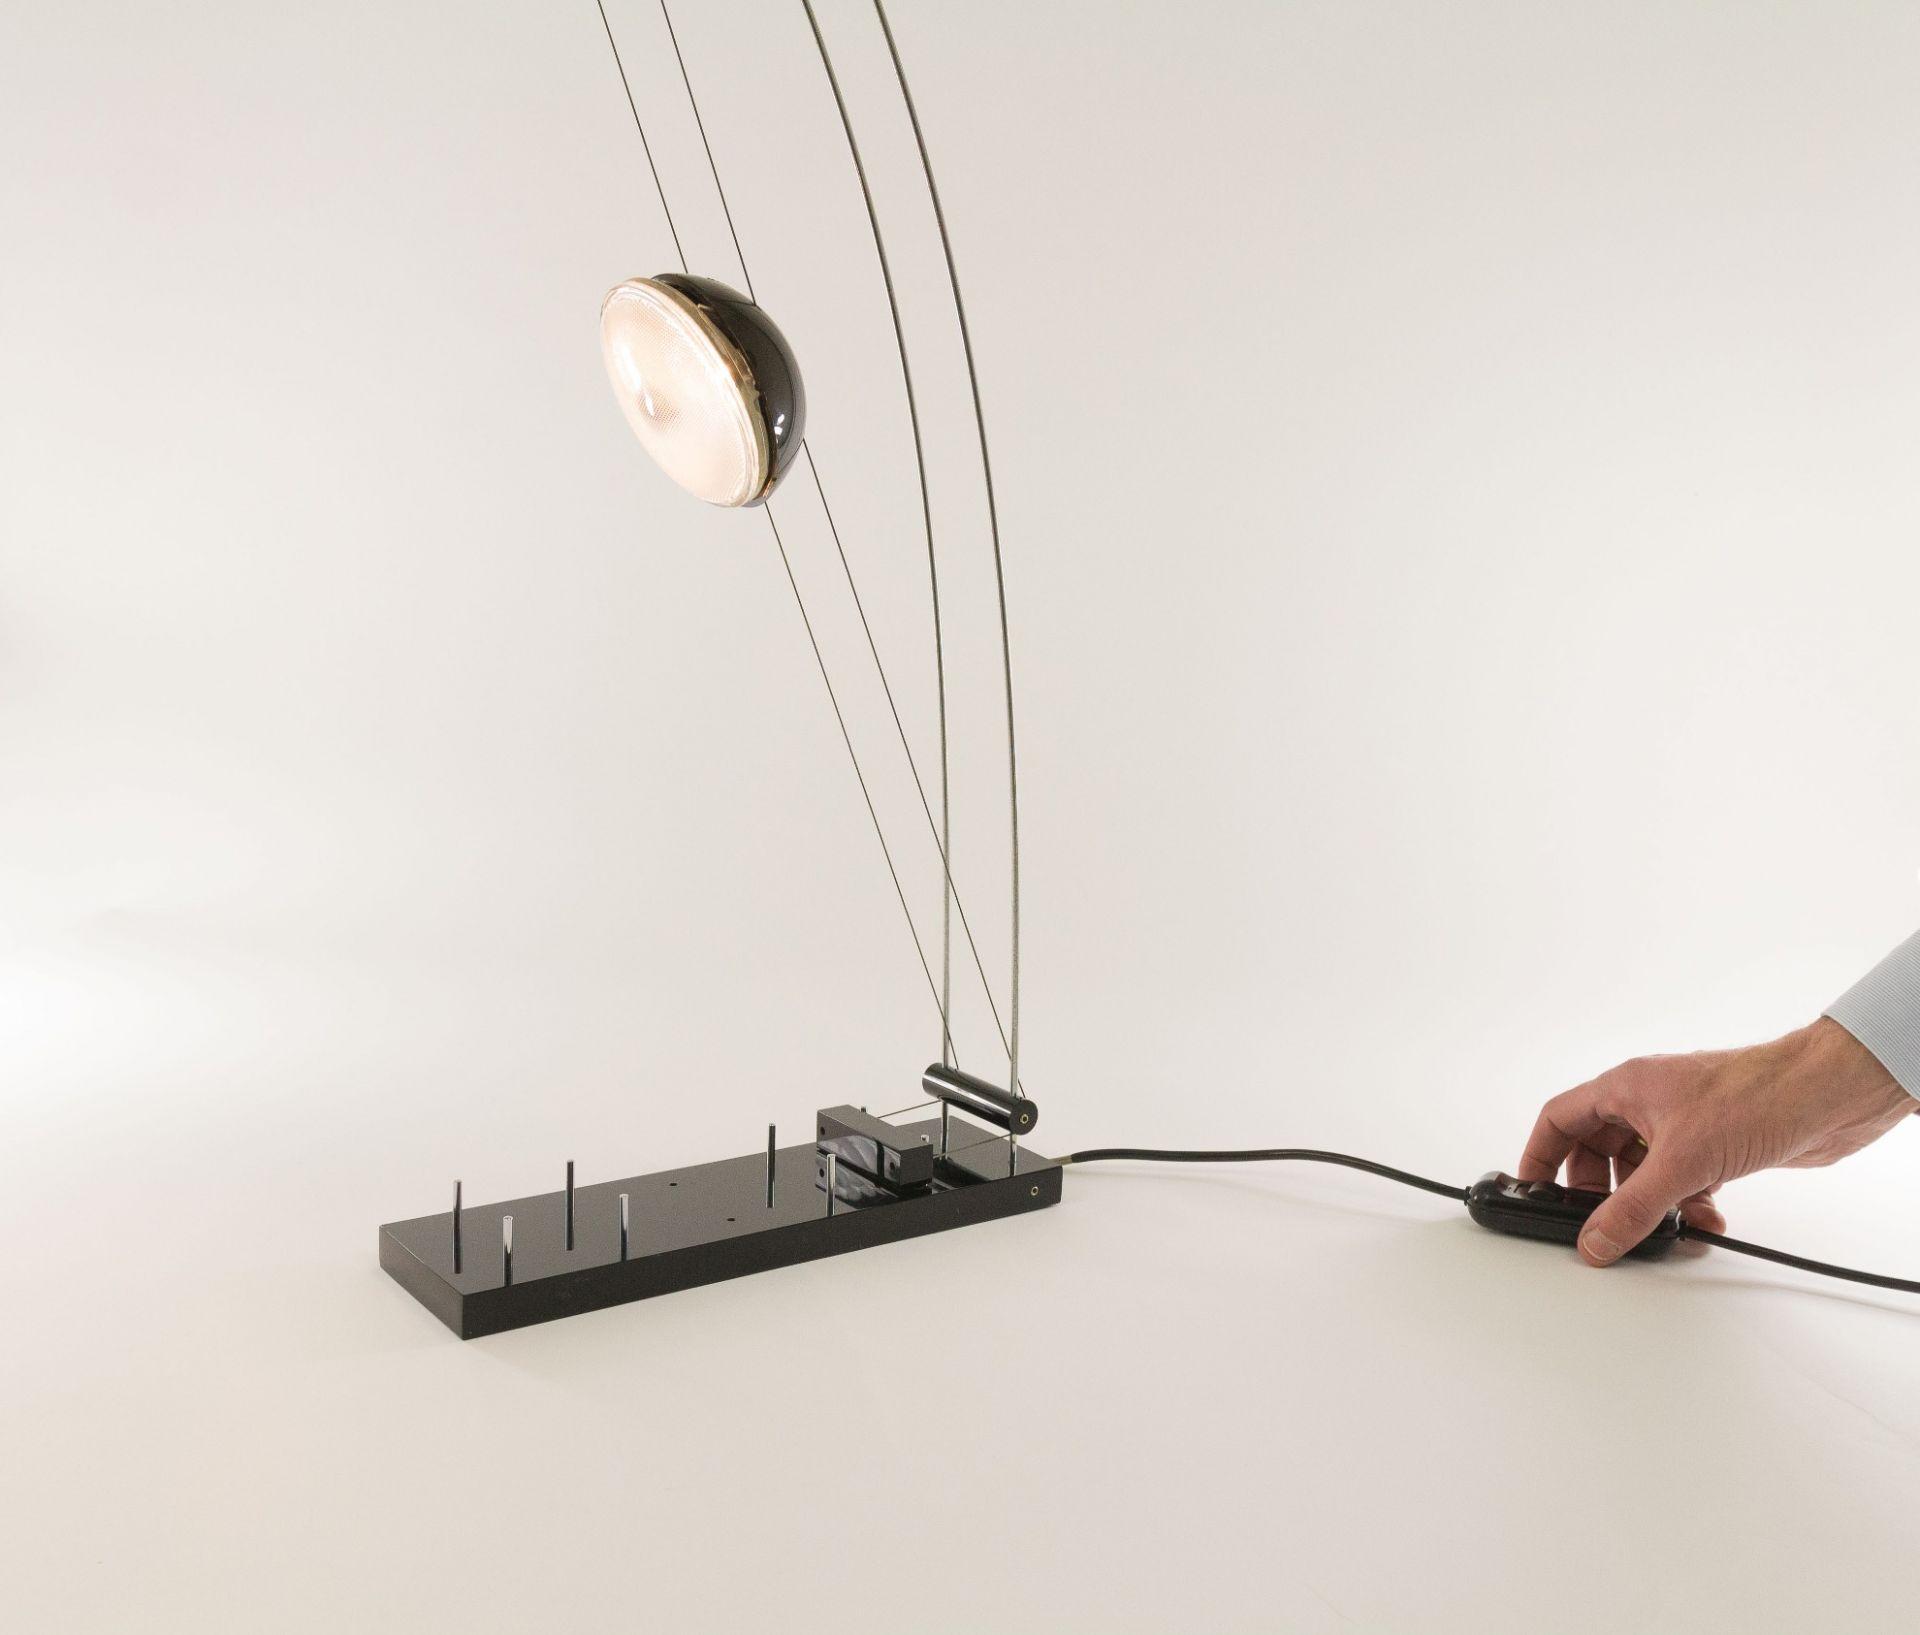 Lighting sculpture 'Arco-nero' designed by Axel Meise forAML Licht + Design, 19